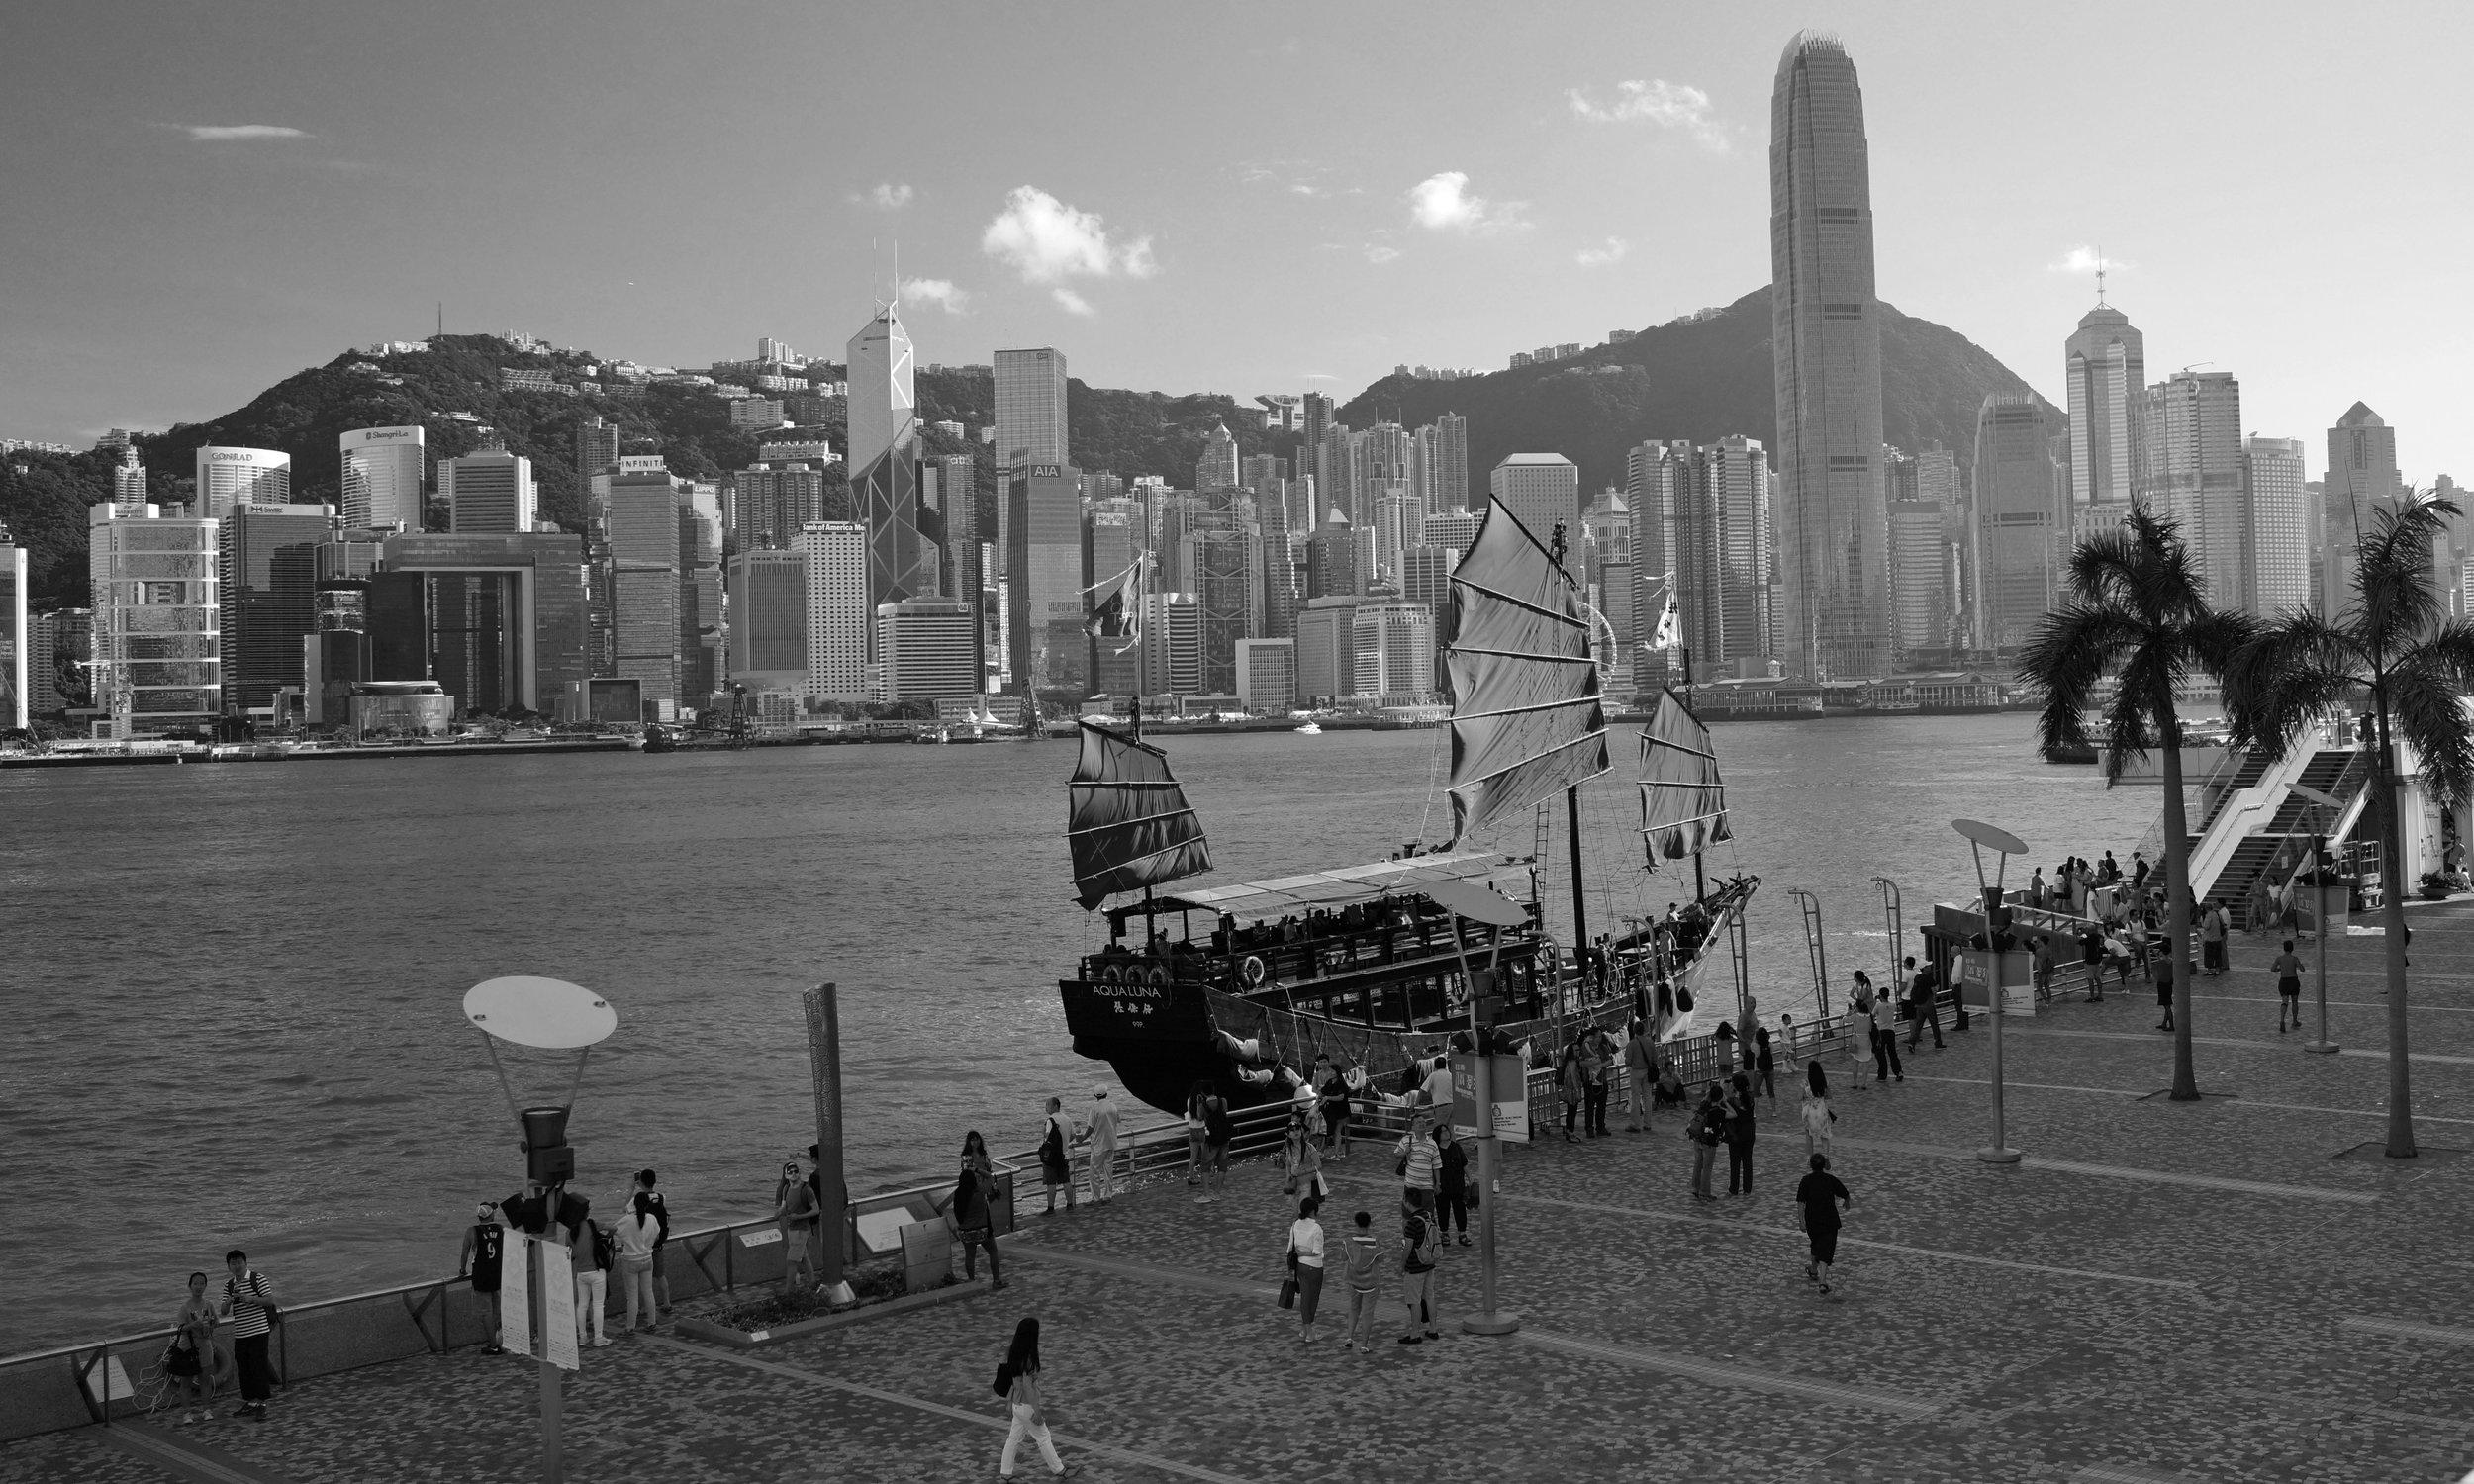 The Aqua Luna Junk at TST Promenade looking across to Hong Kong Island.jpg